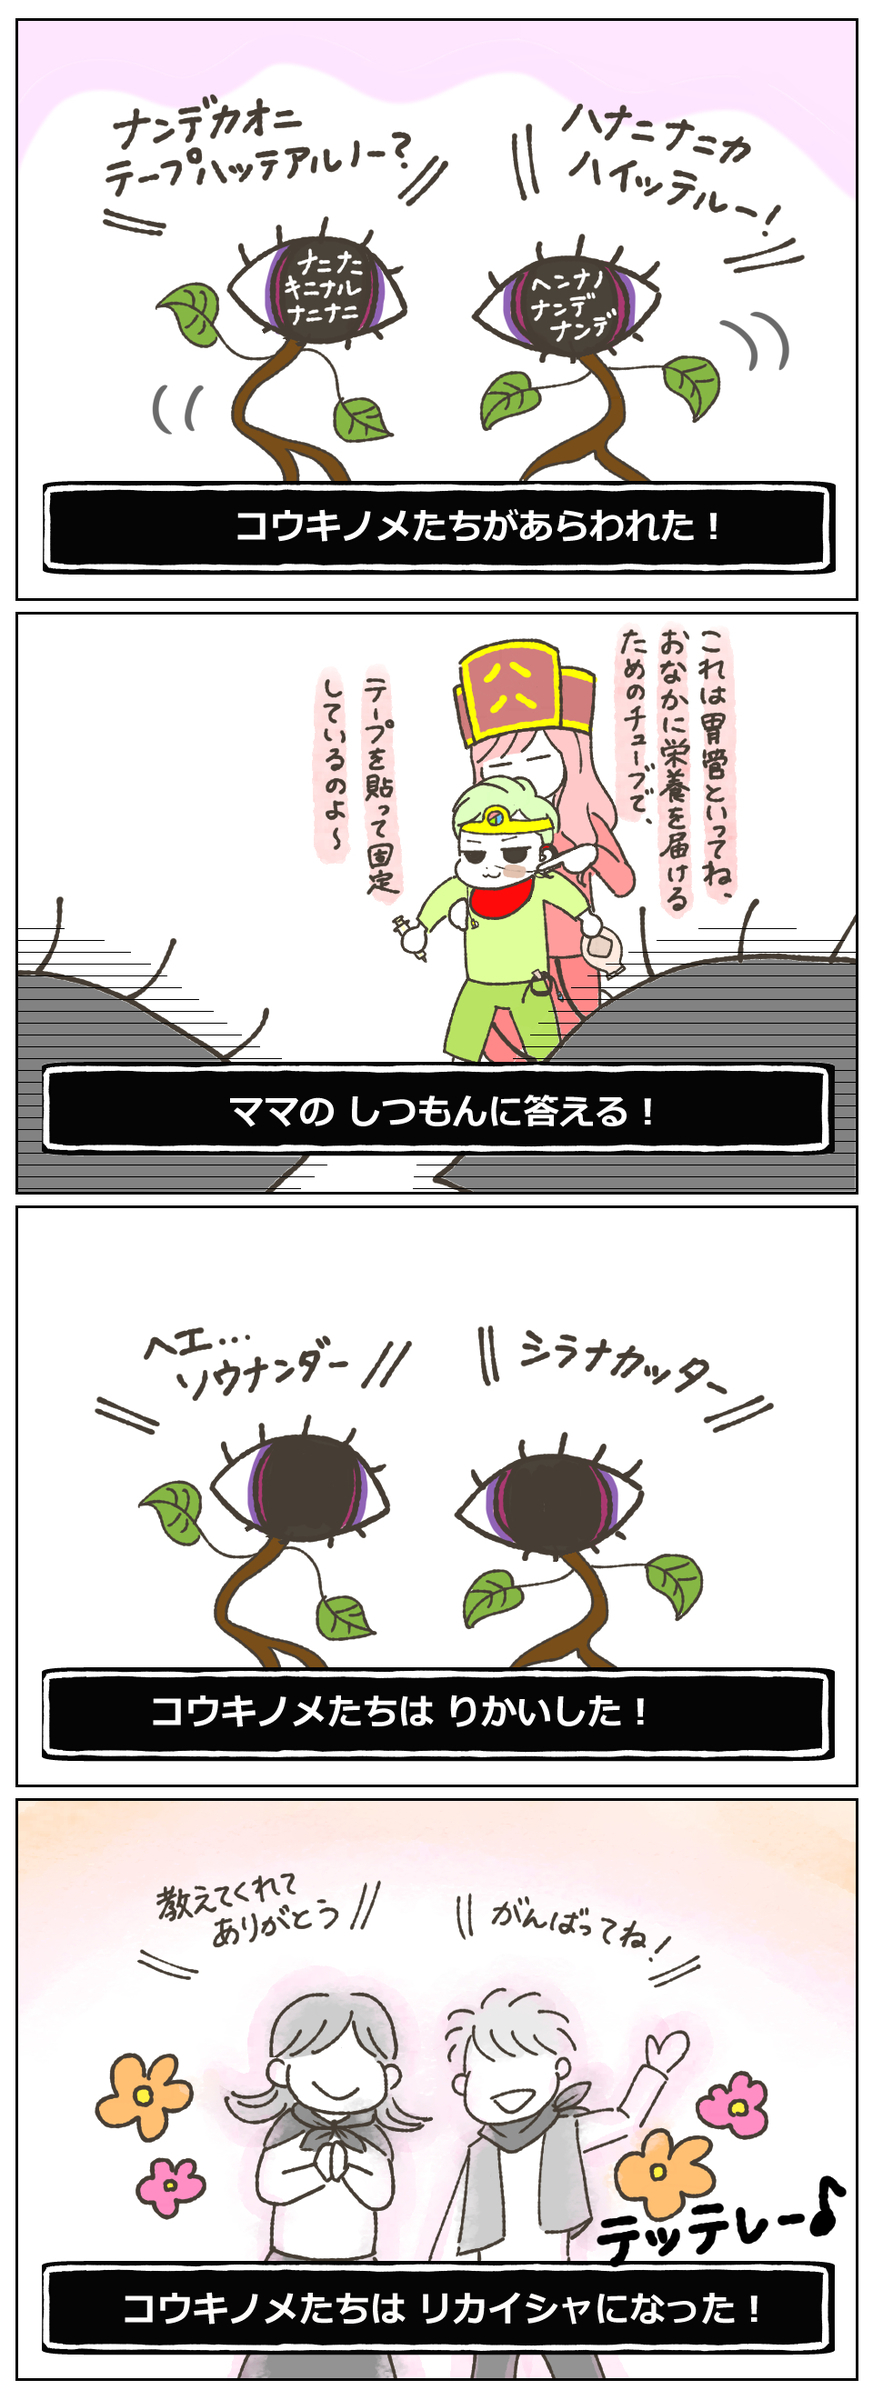 f:id:kayarimo:20190602203649j:plain